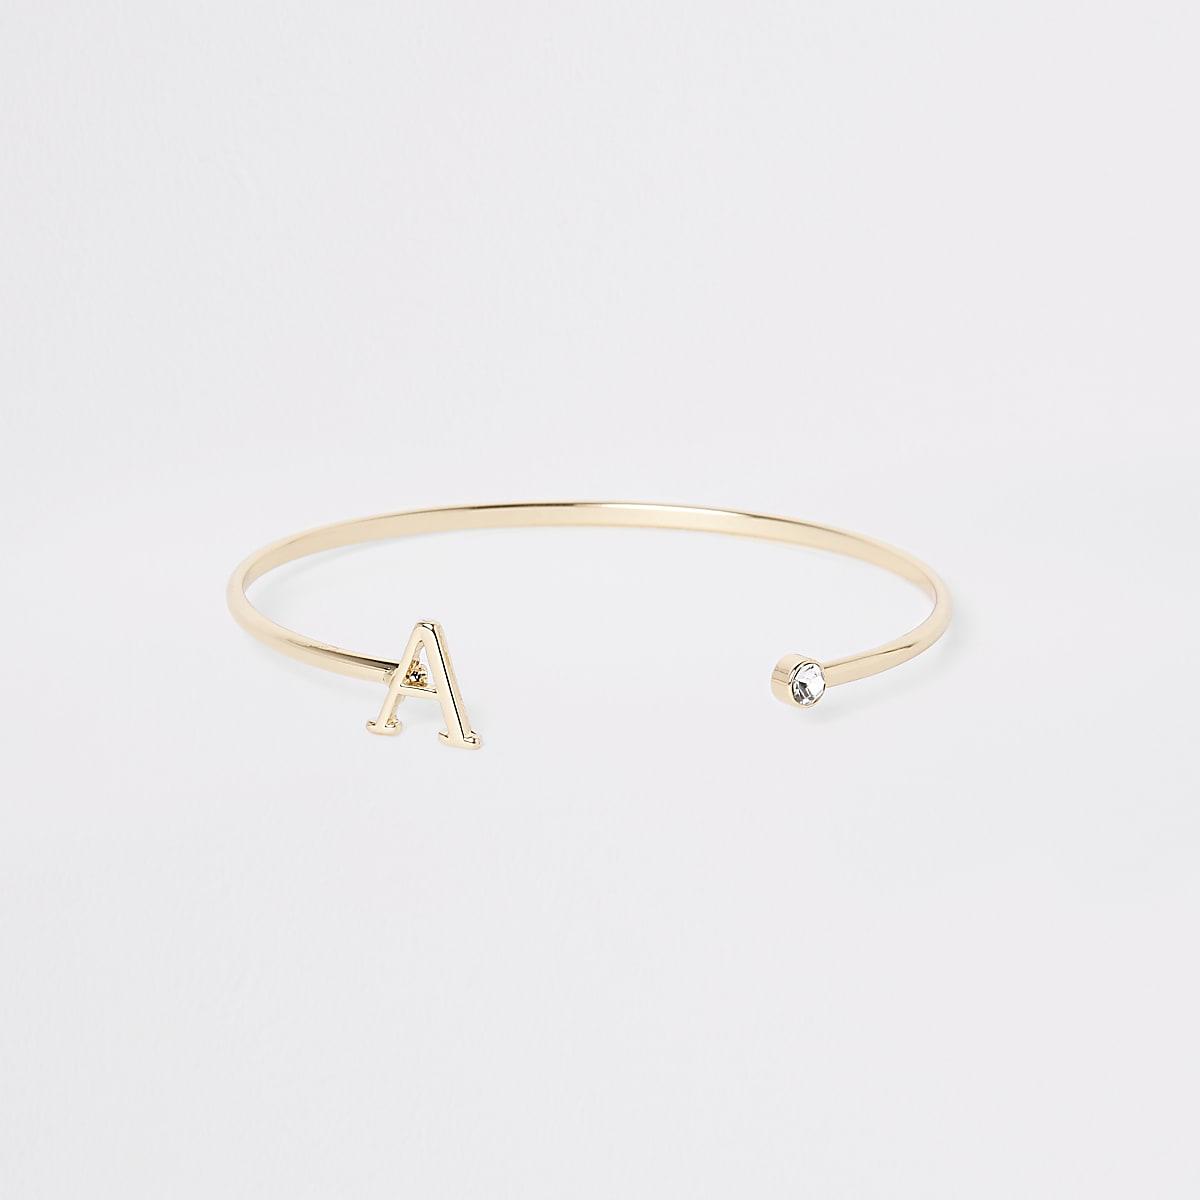 Gold plated 'A' initial cuff bracelet